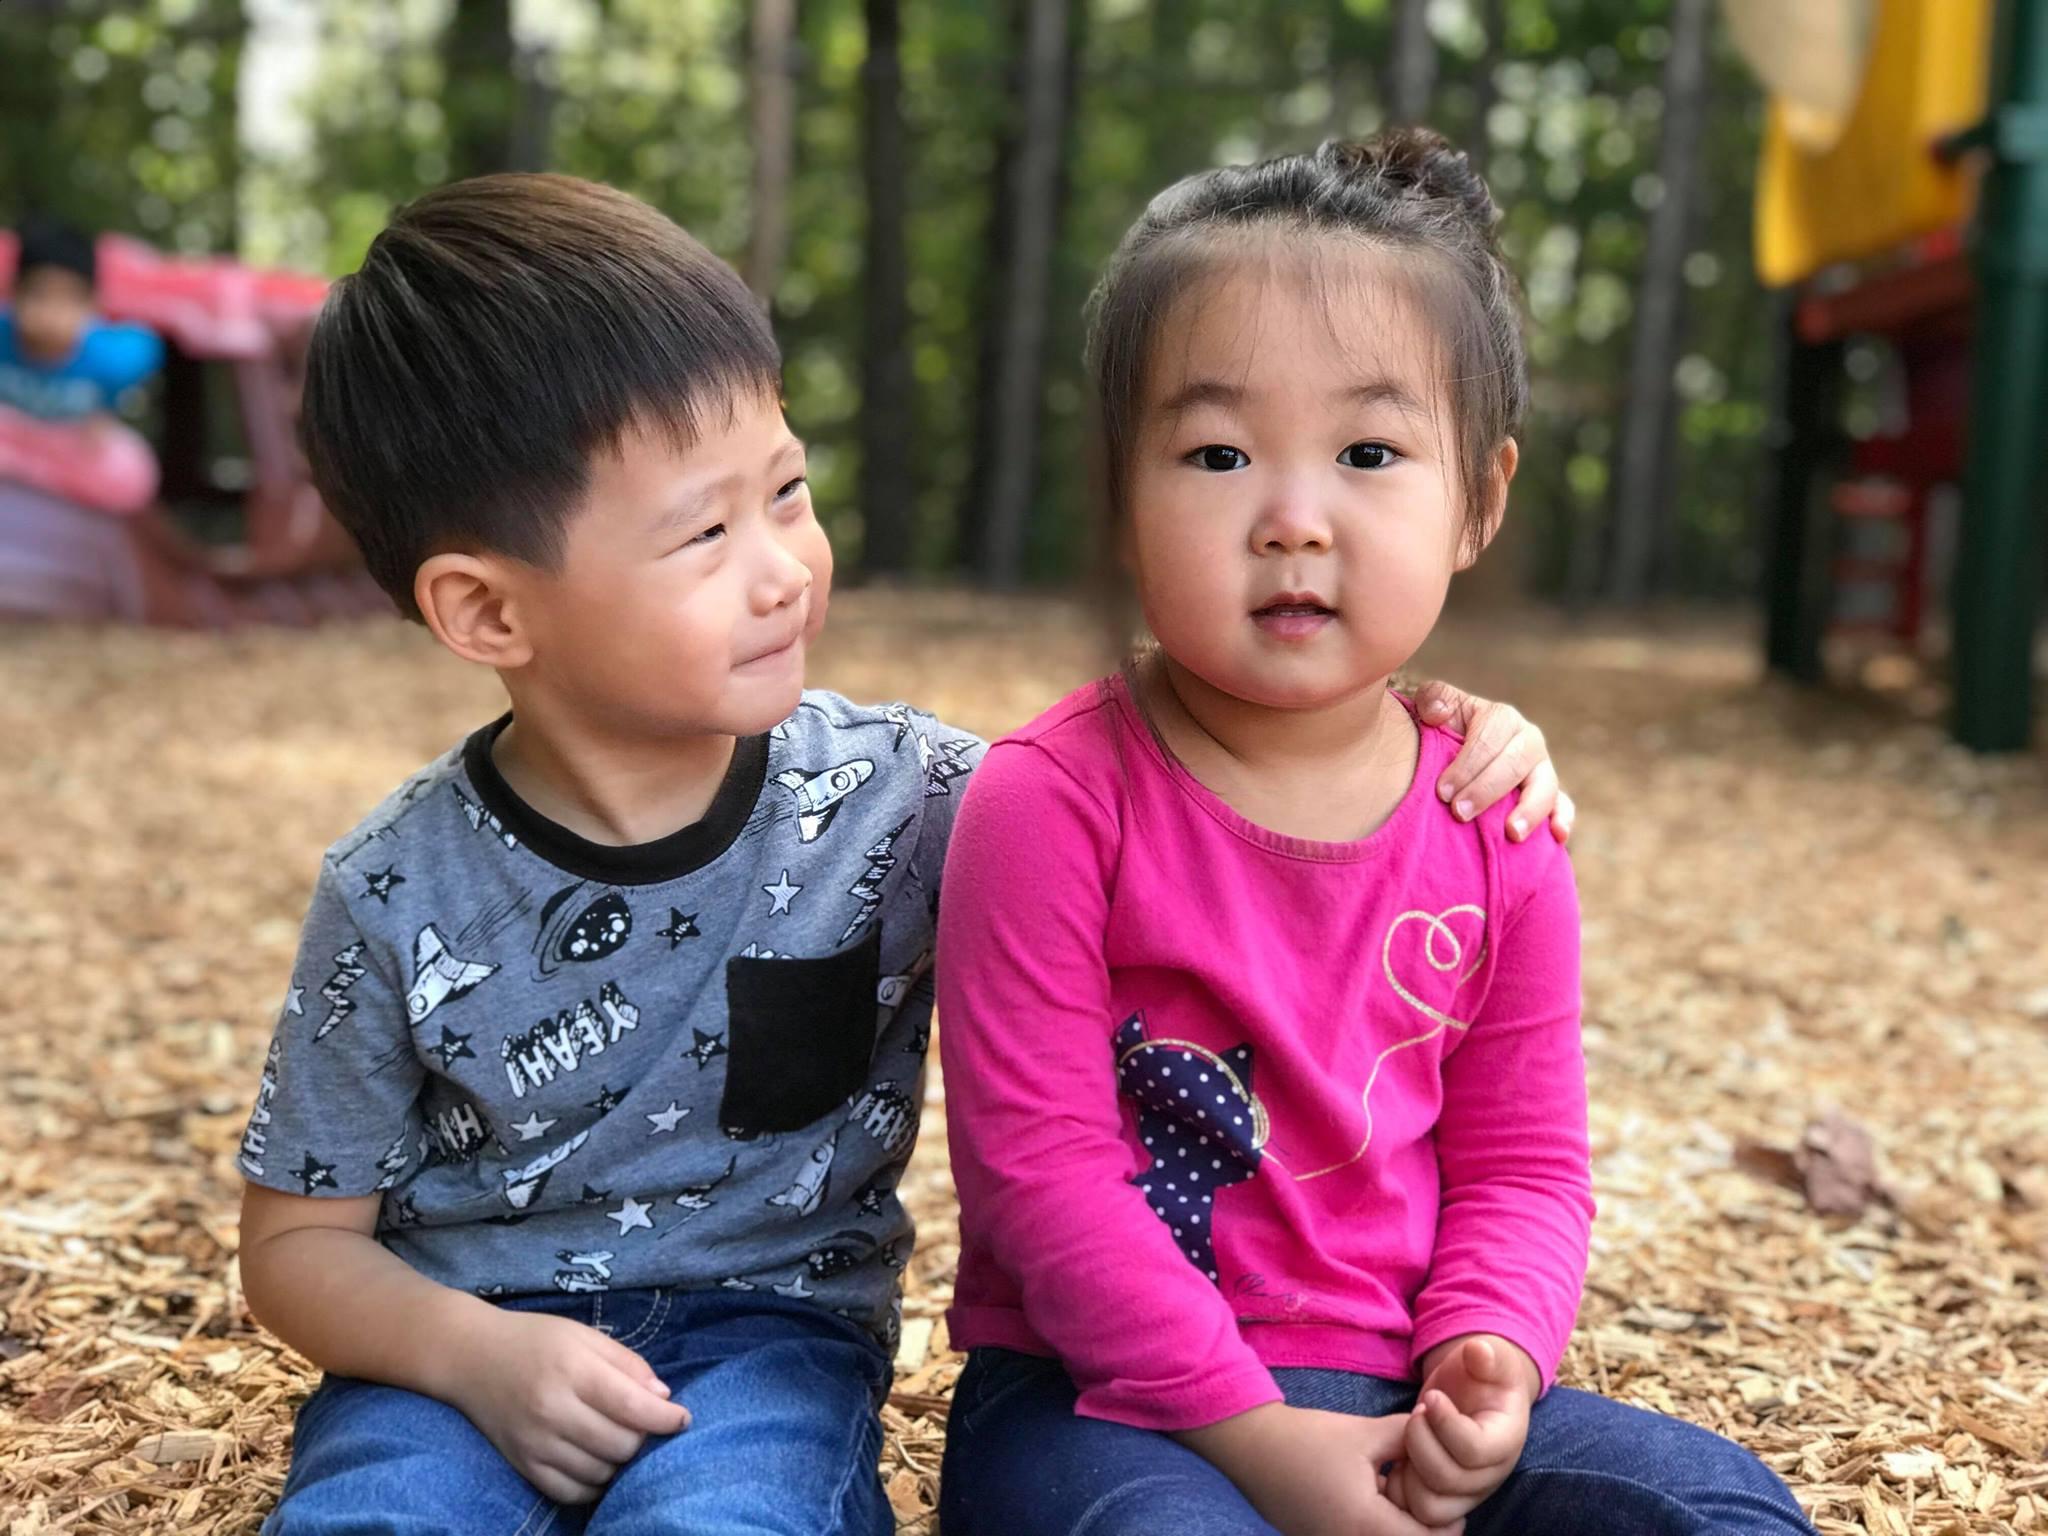 preschool girl and boy on playground